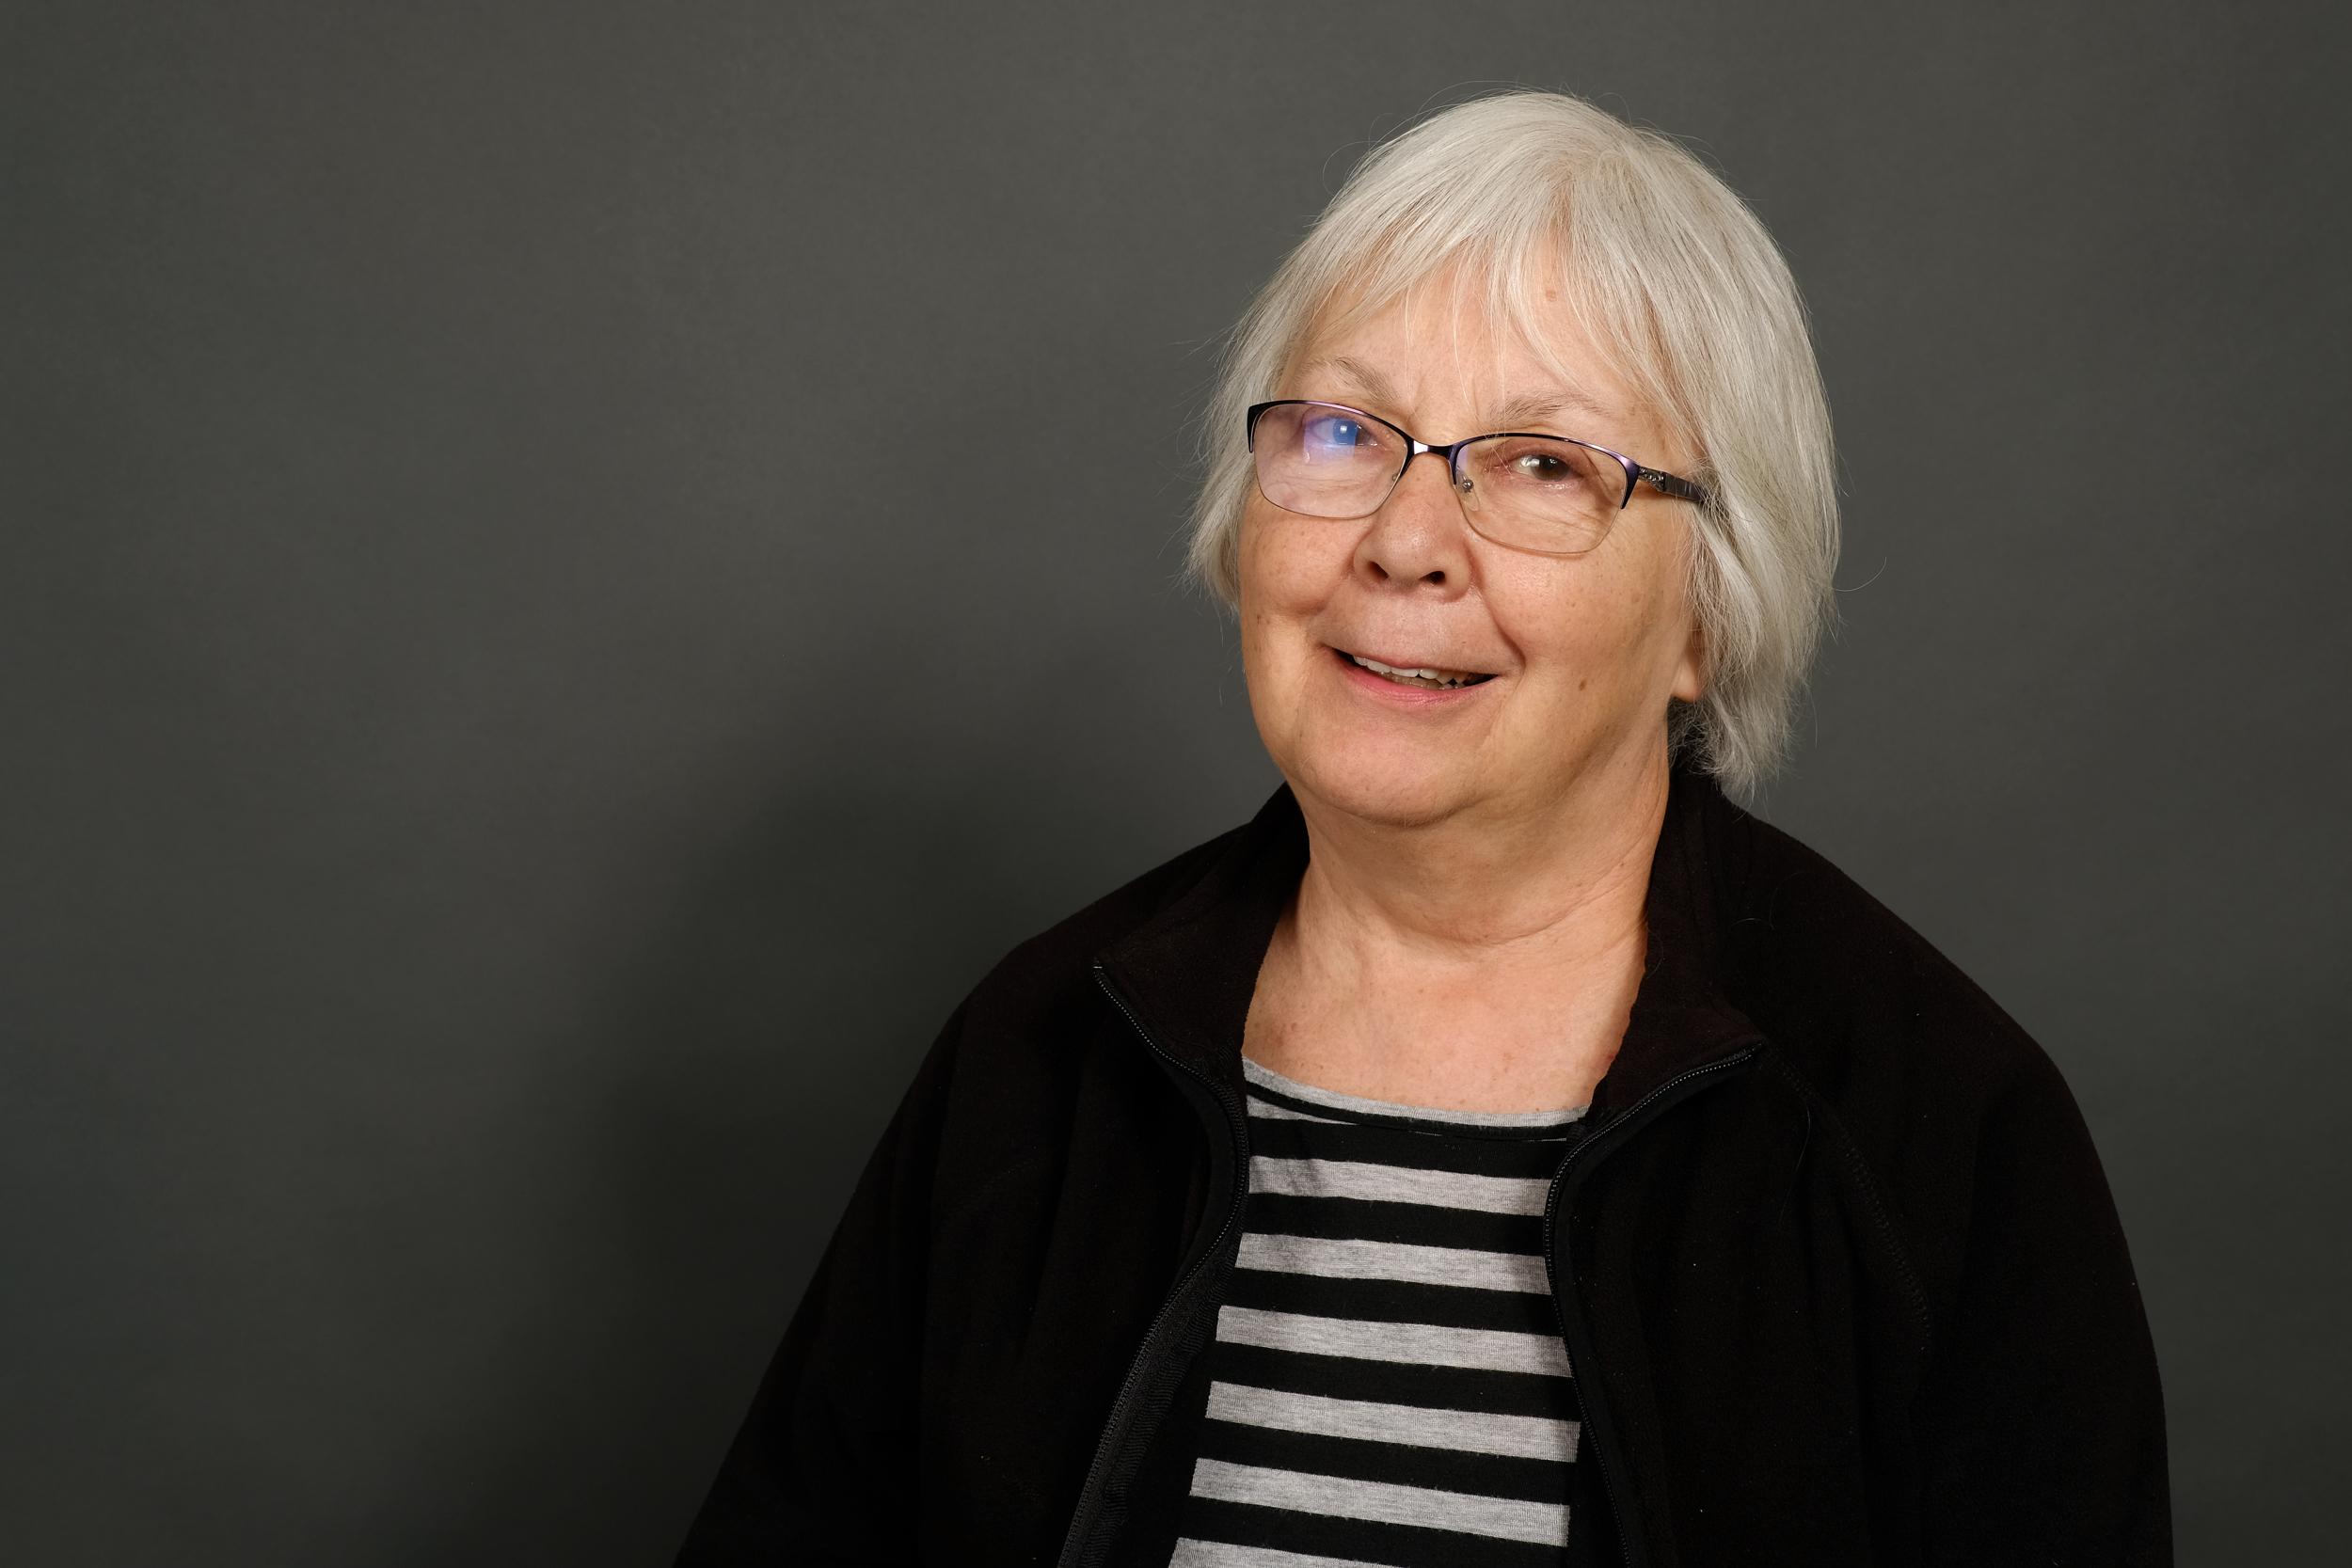 Kathy Gemperle